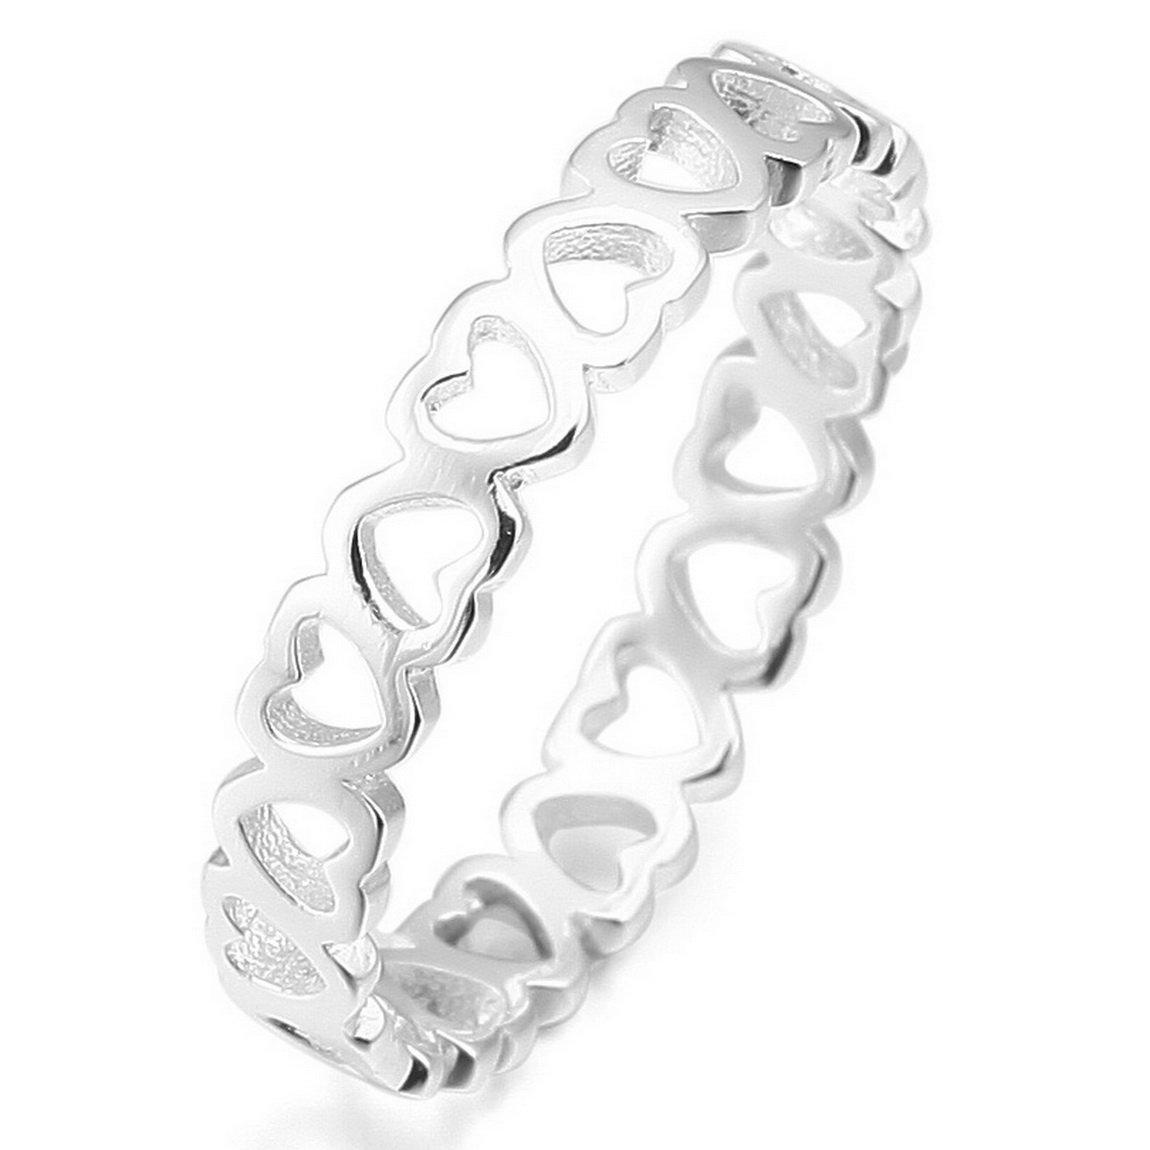 INBLUE Women's 925 Sterling Silver Ring Silver Tone Heart Wedding Love INBLUE Jewelry mne812-parent